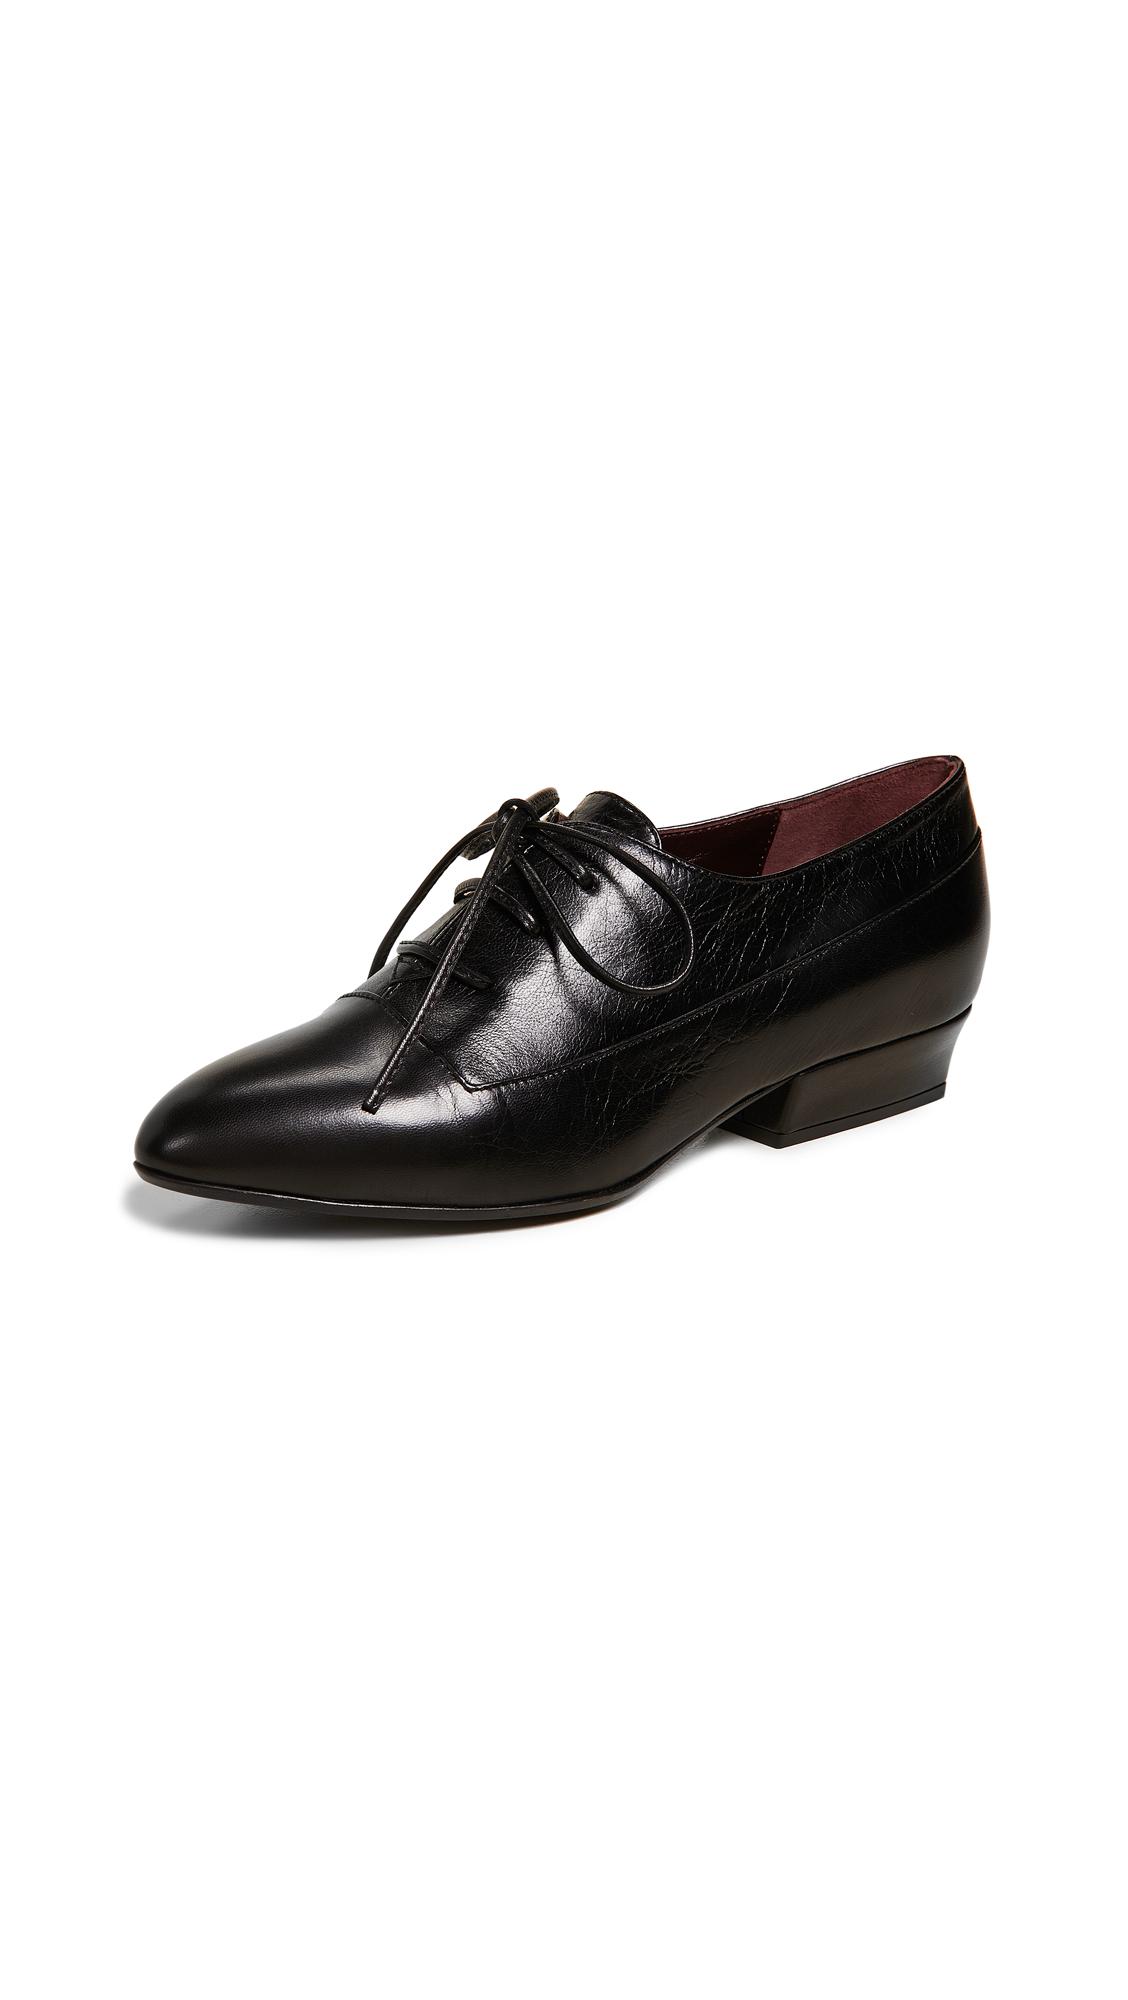 Leather Oxfords, Black